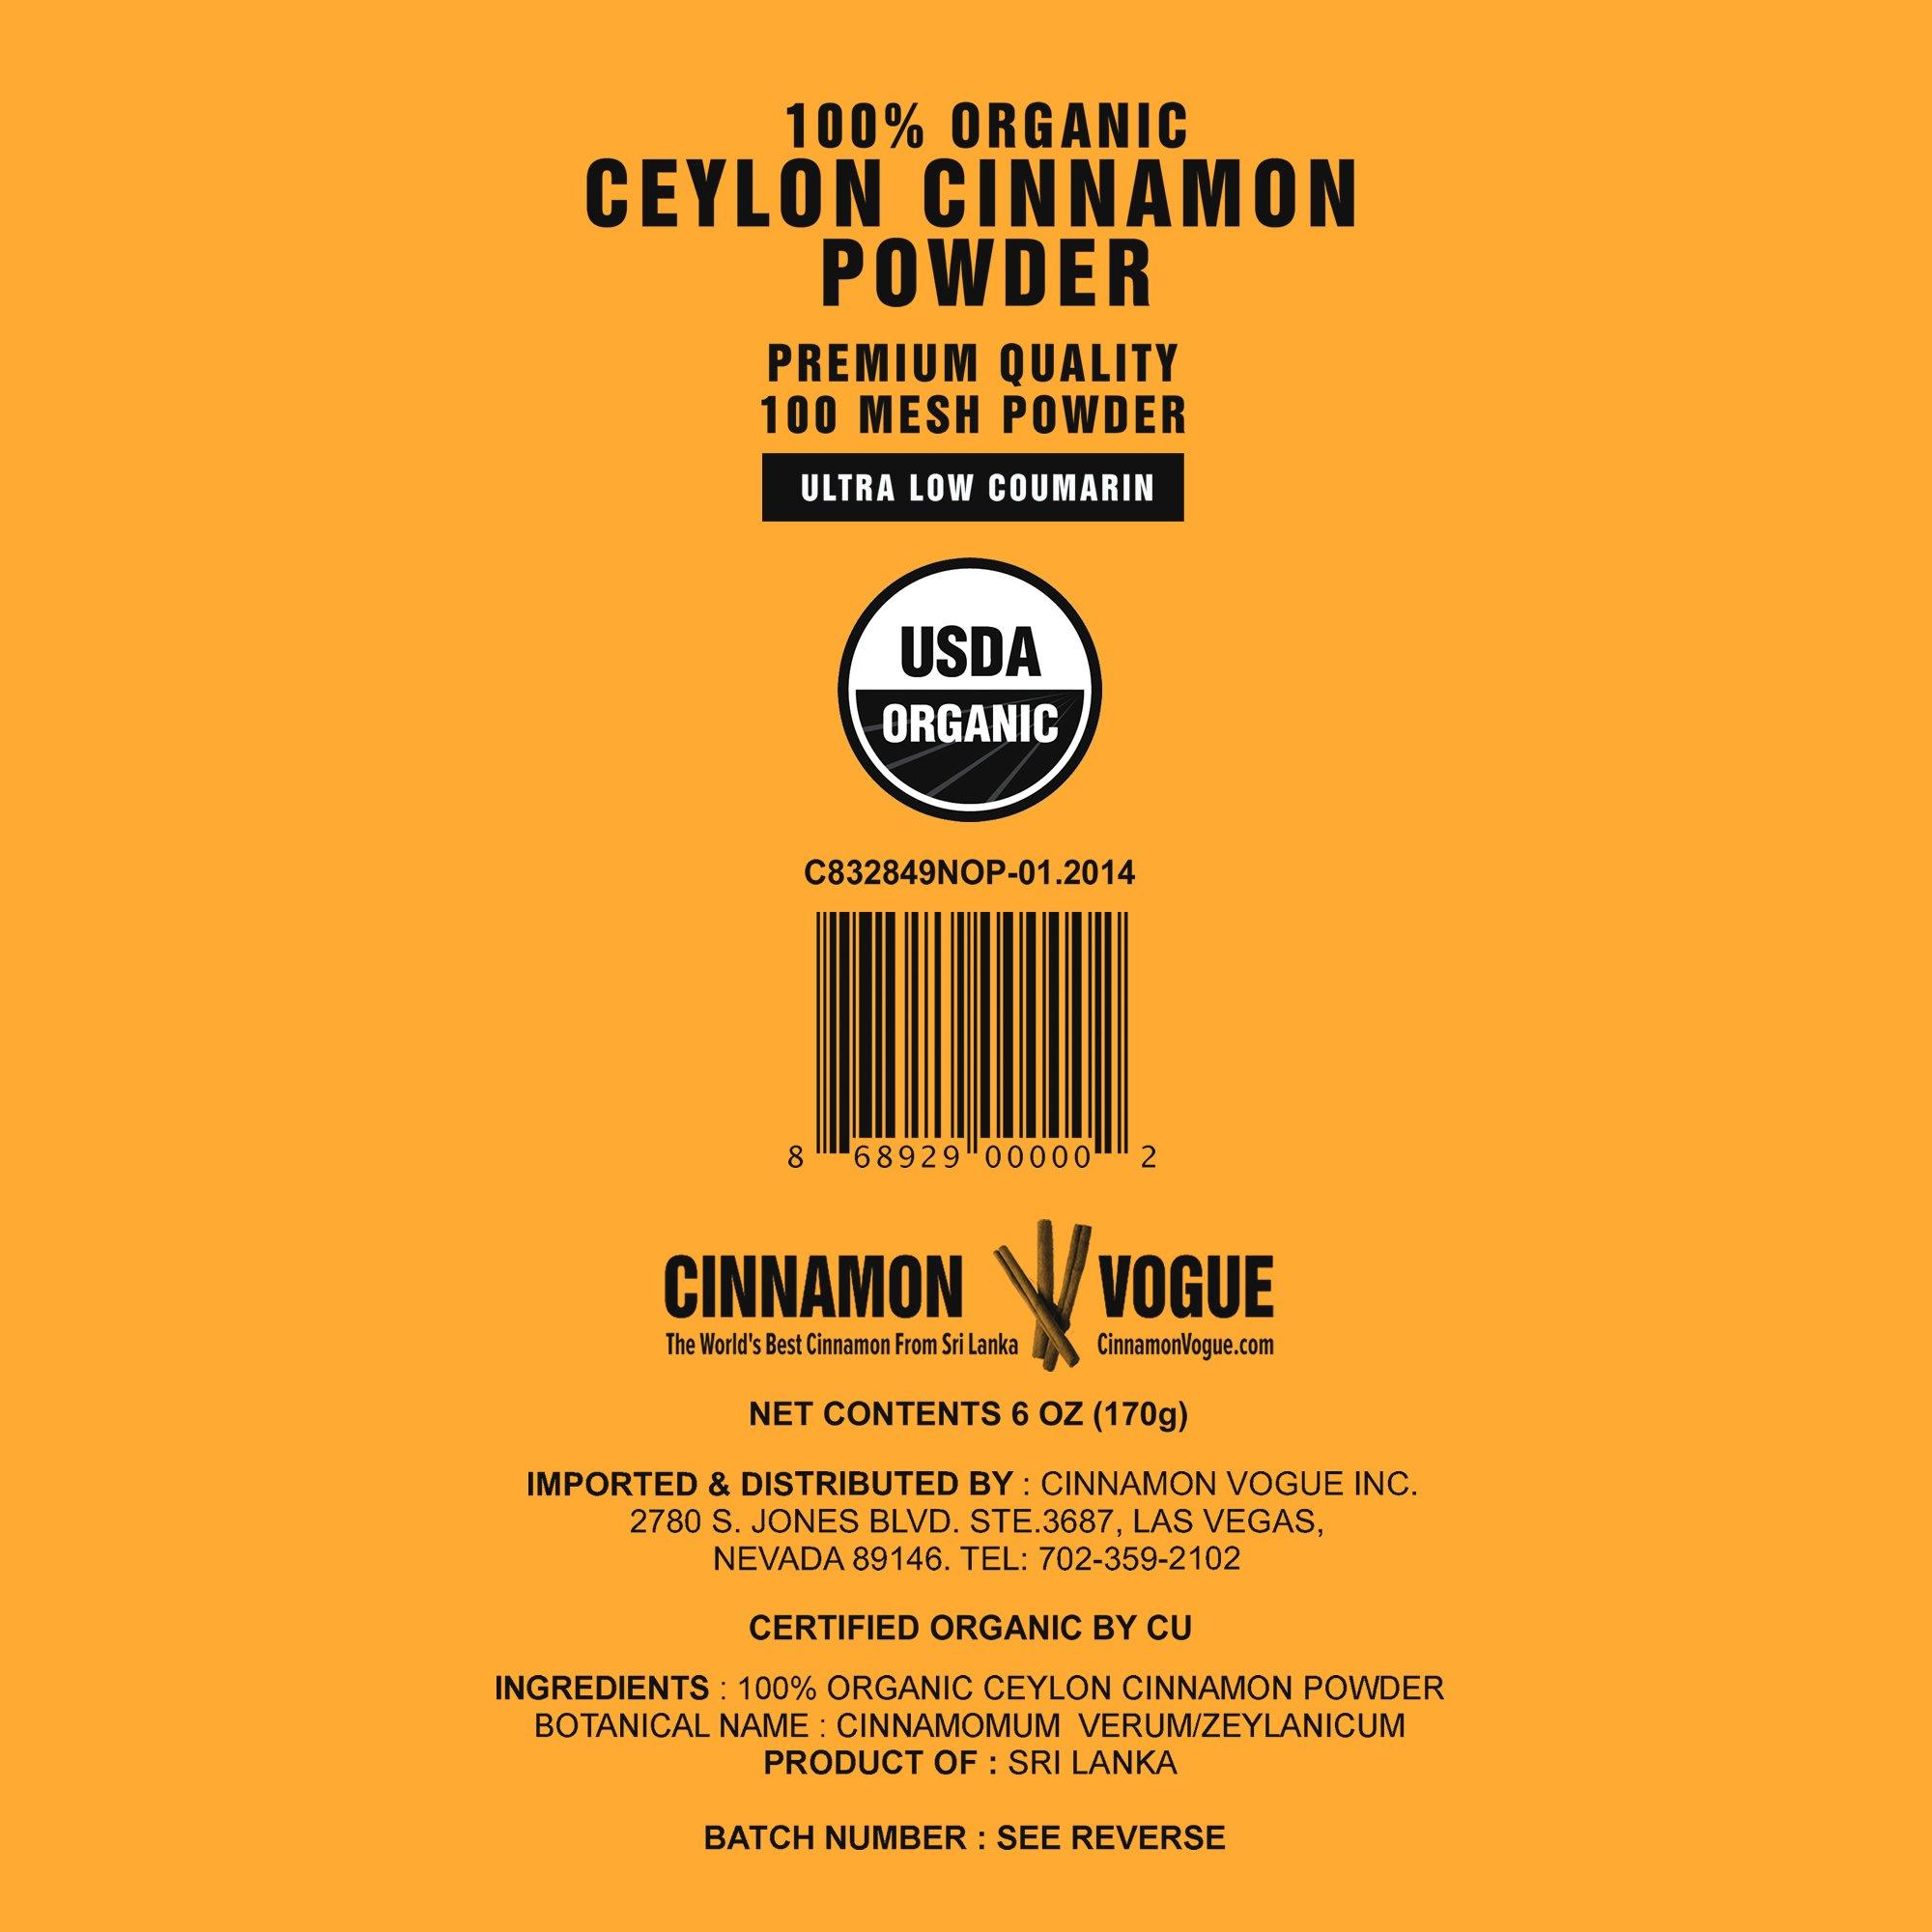 Ceylon Cinnamon Powder – 6 oz. (100% USDA Organic) - Ultra Premium Fine 100 Mesh Powder, Salt Free, Non irradiated, Low Coumarin by Cinnamon Vogue (Image #7)